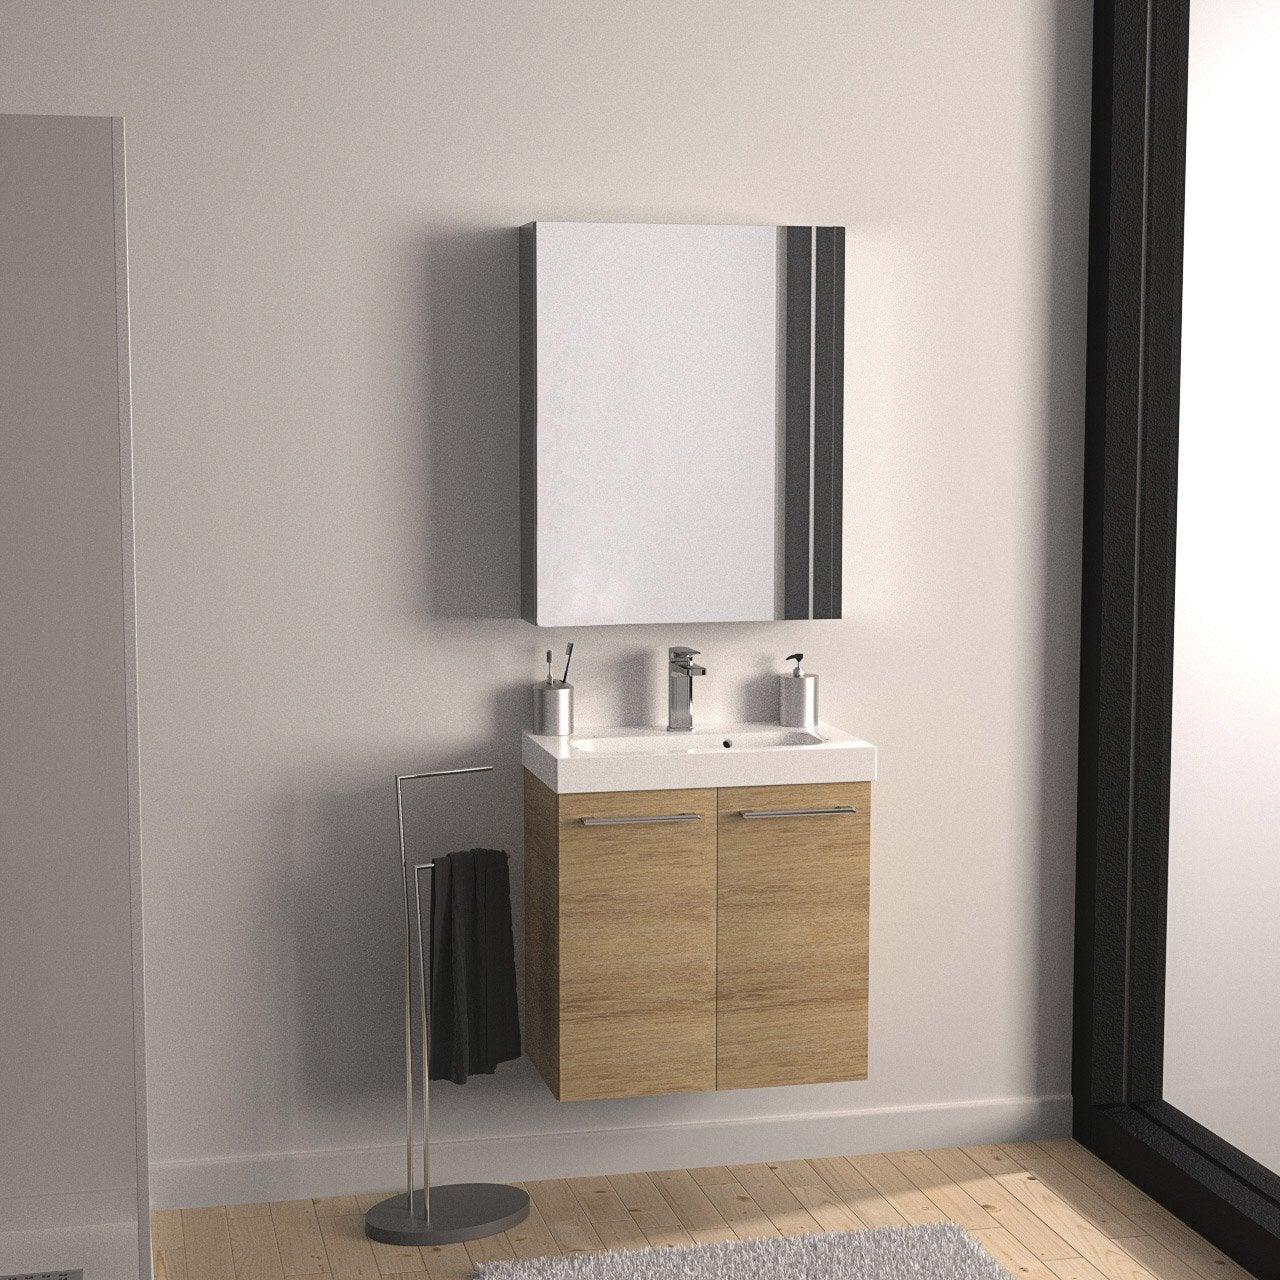 meuble de salle de bains de 60 79 marron remix leroy merlin - Meuble Salle De Bain Marron